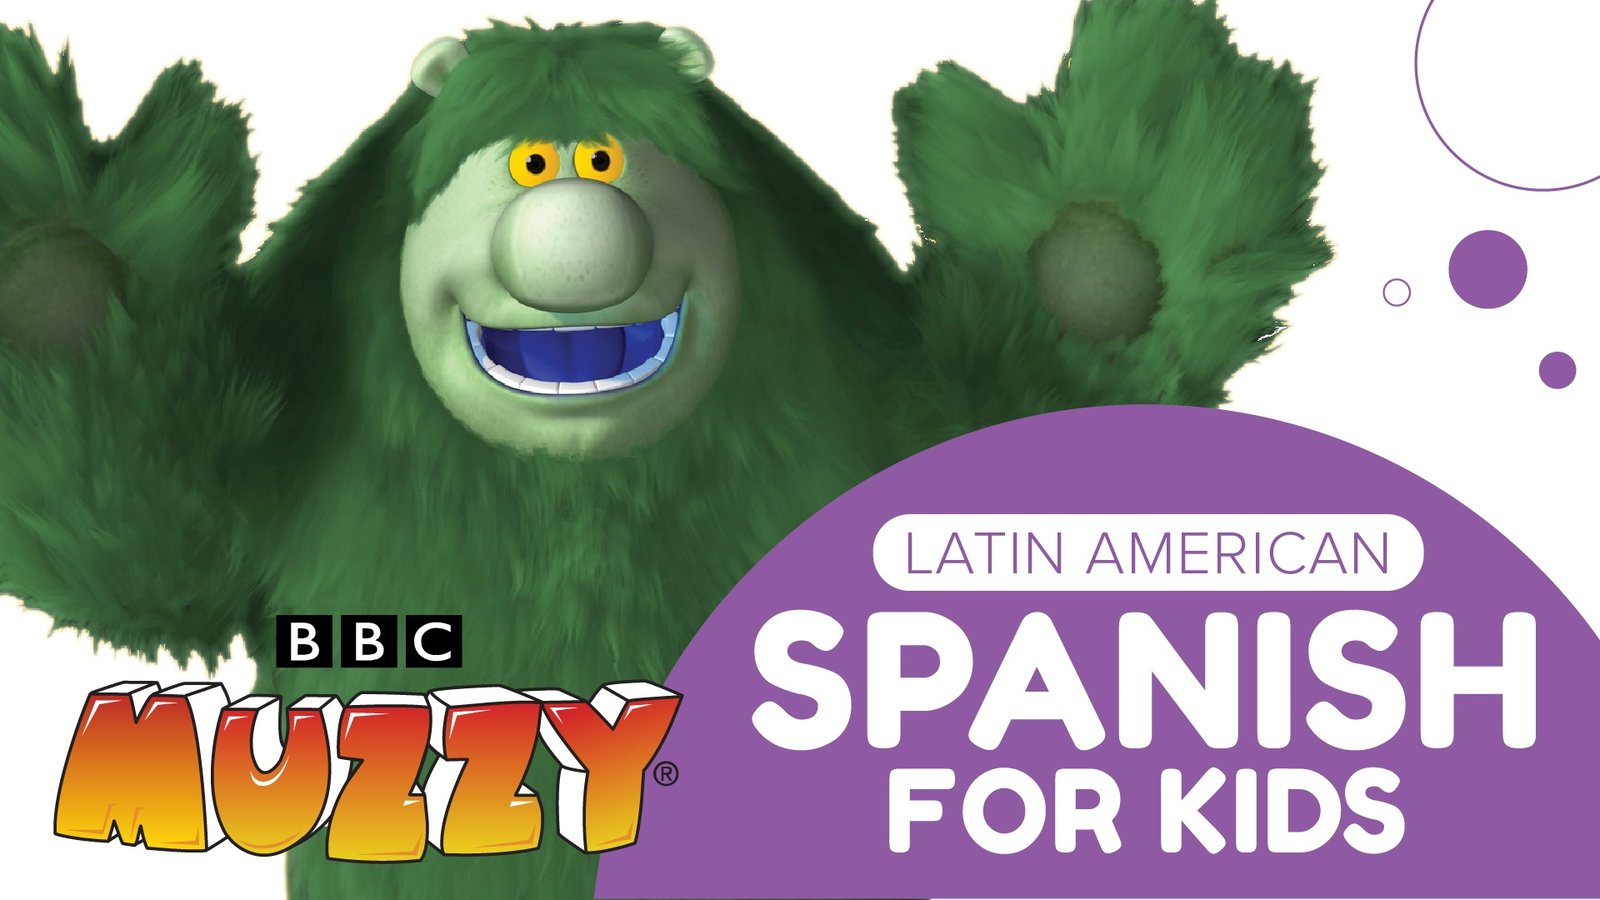 Spanish (Latin American) for Kids